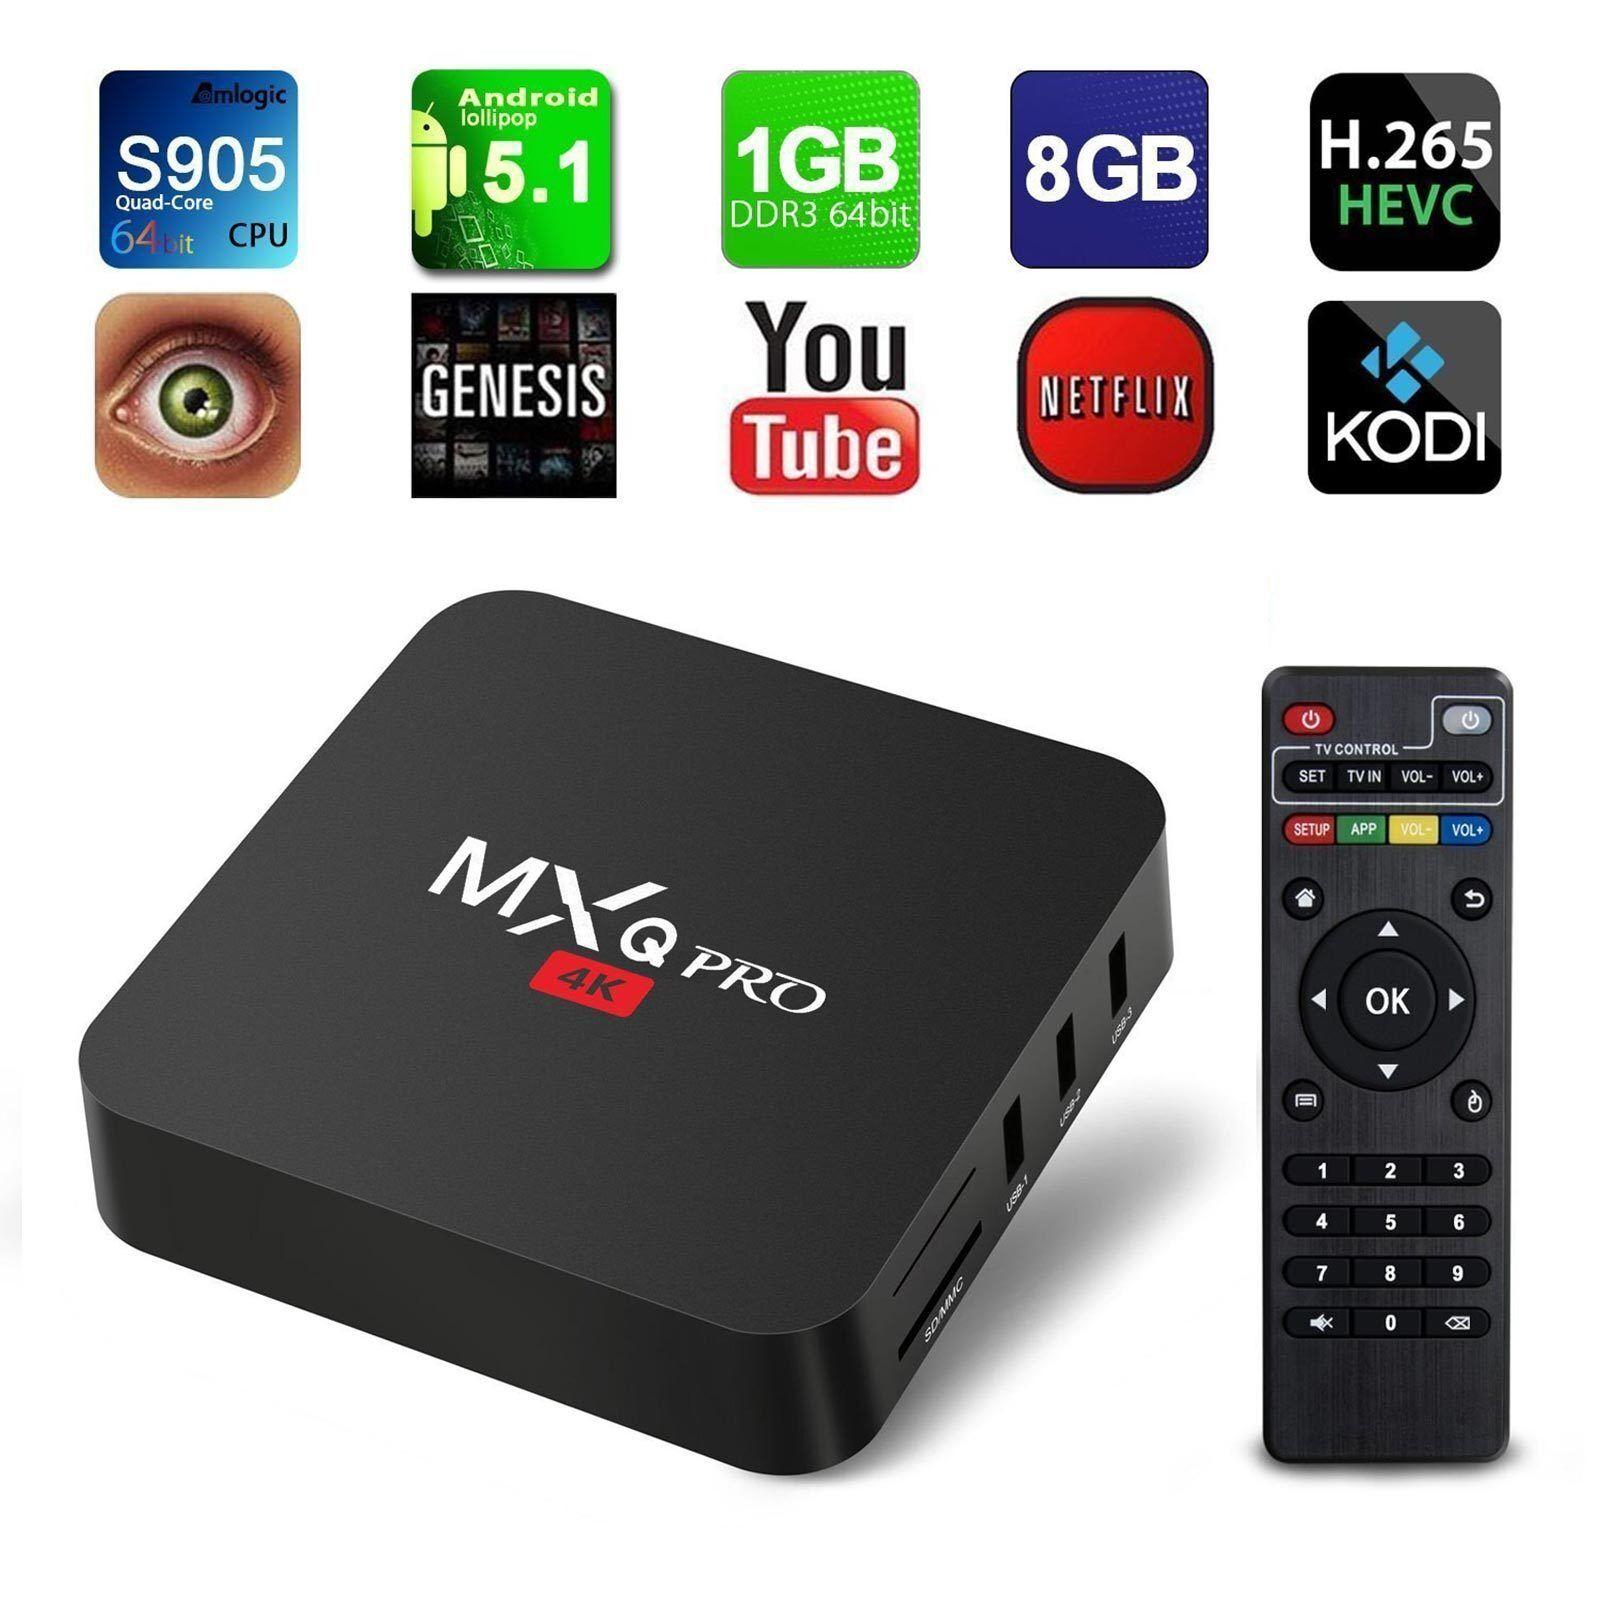 MXQ Pro 4K 3D 64Bit Android 7.1 Quad Core Smart TV Box 1080P HDMI WIFI KODI 17.6 Featured